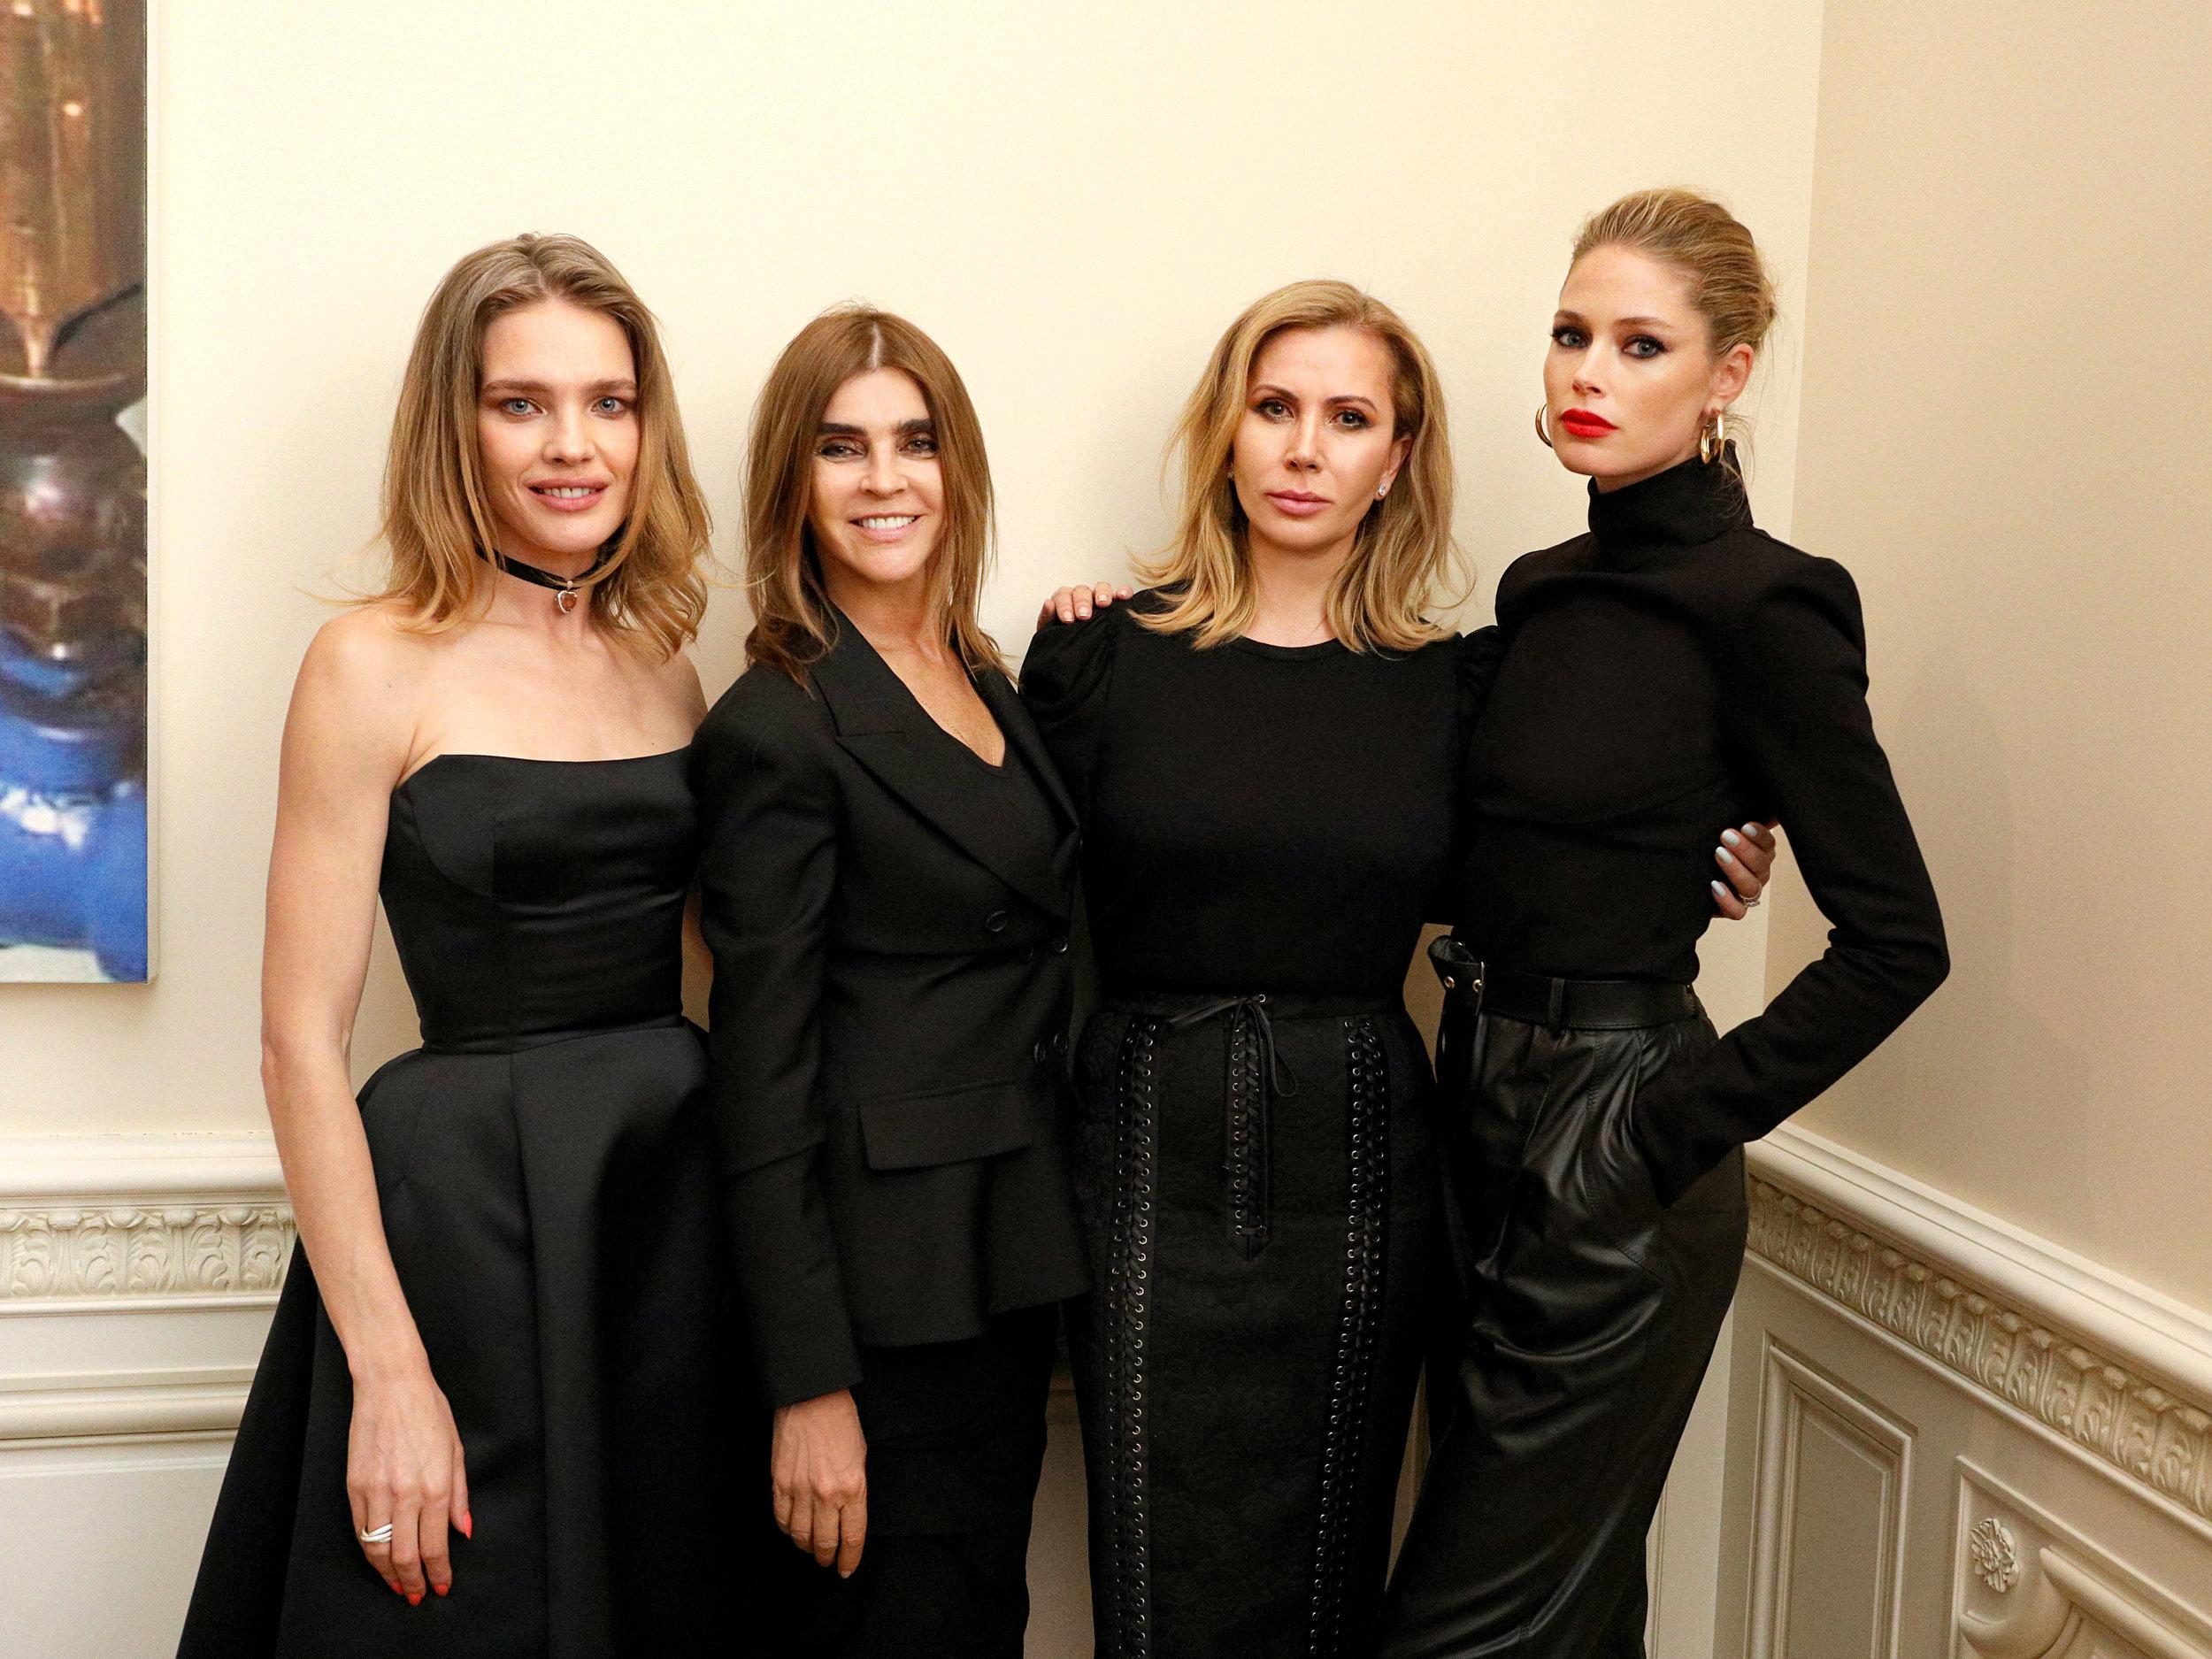 Natalia Vodianova, Carine Roitfeld, Inga Rubenstein, and Doutzen Kroes.